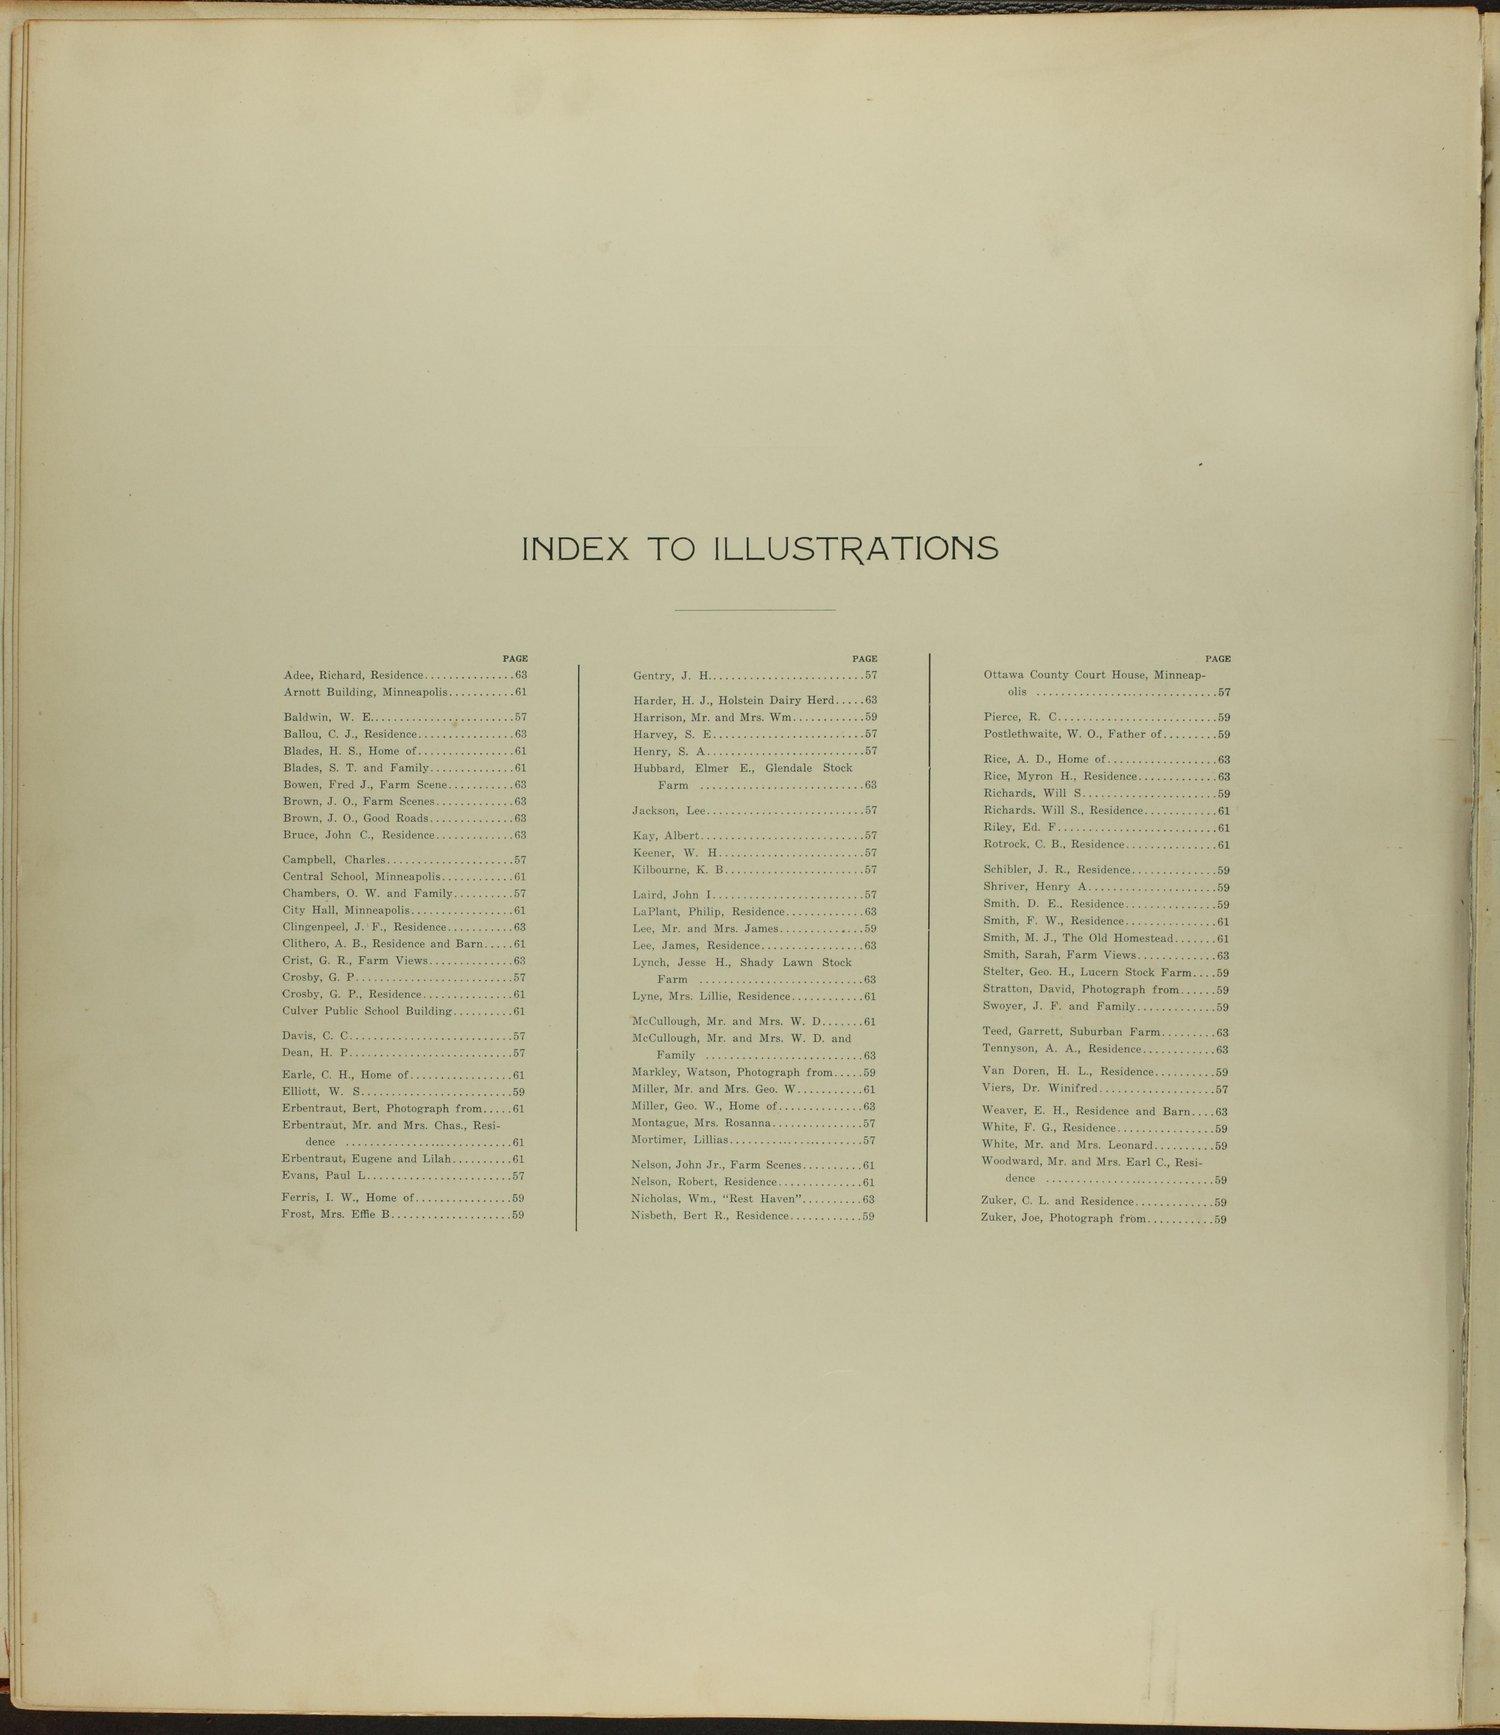 Standard atlas of Ottawa County, Kansas - Index to illustrations